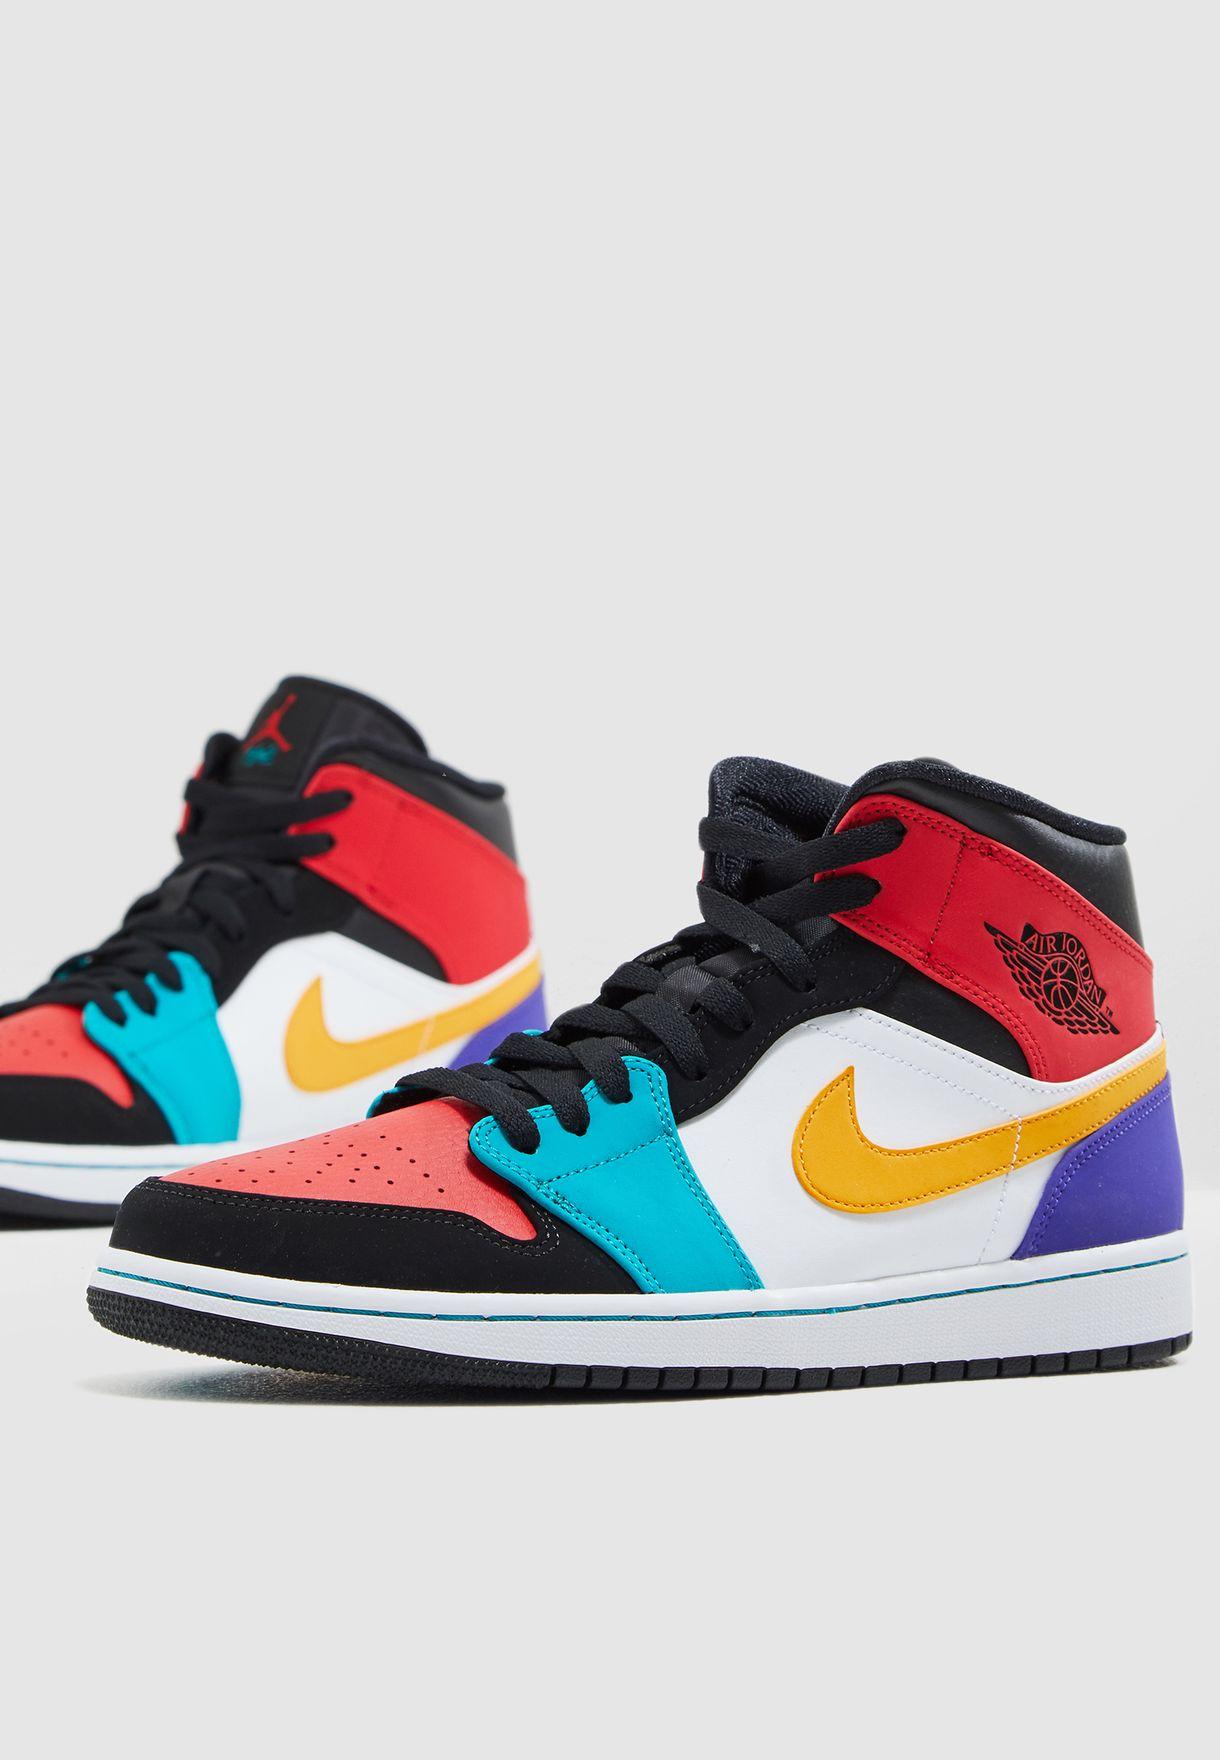 hot sale online 01e10 2c522 Shop Nike multicolor Air Jordan 1 Mid 554724-125 for Men in UAE -  72704SH61KAP